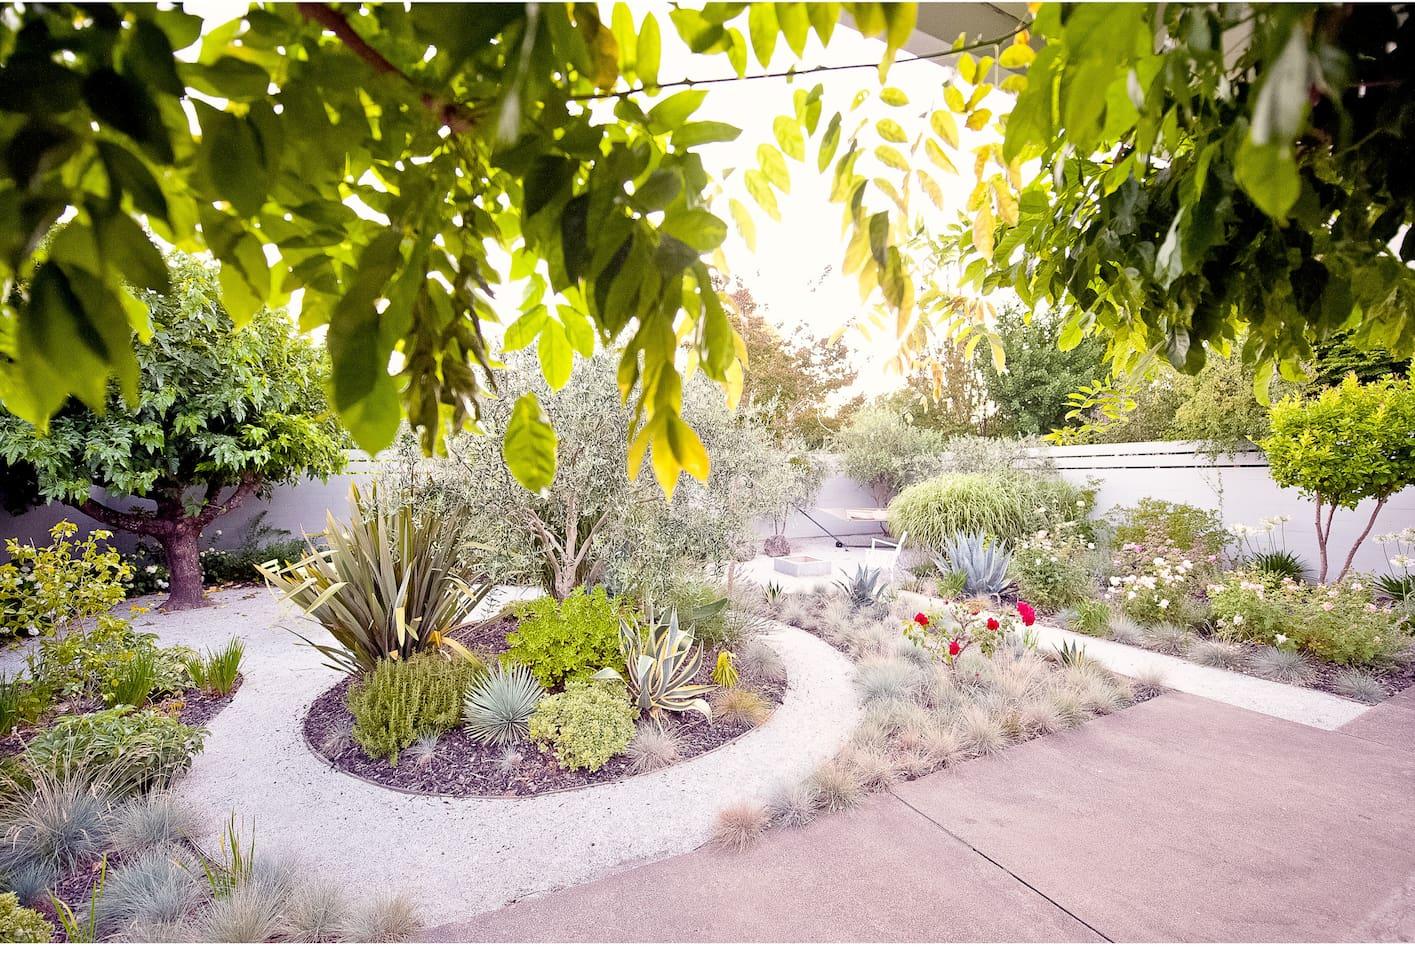 Very private dreamlike garden...